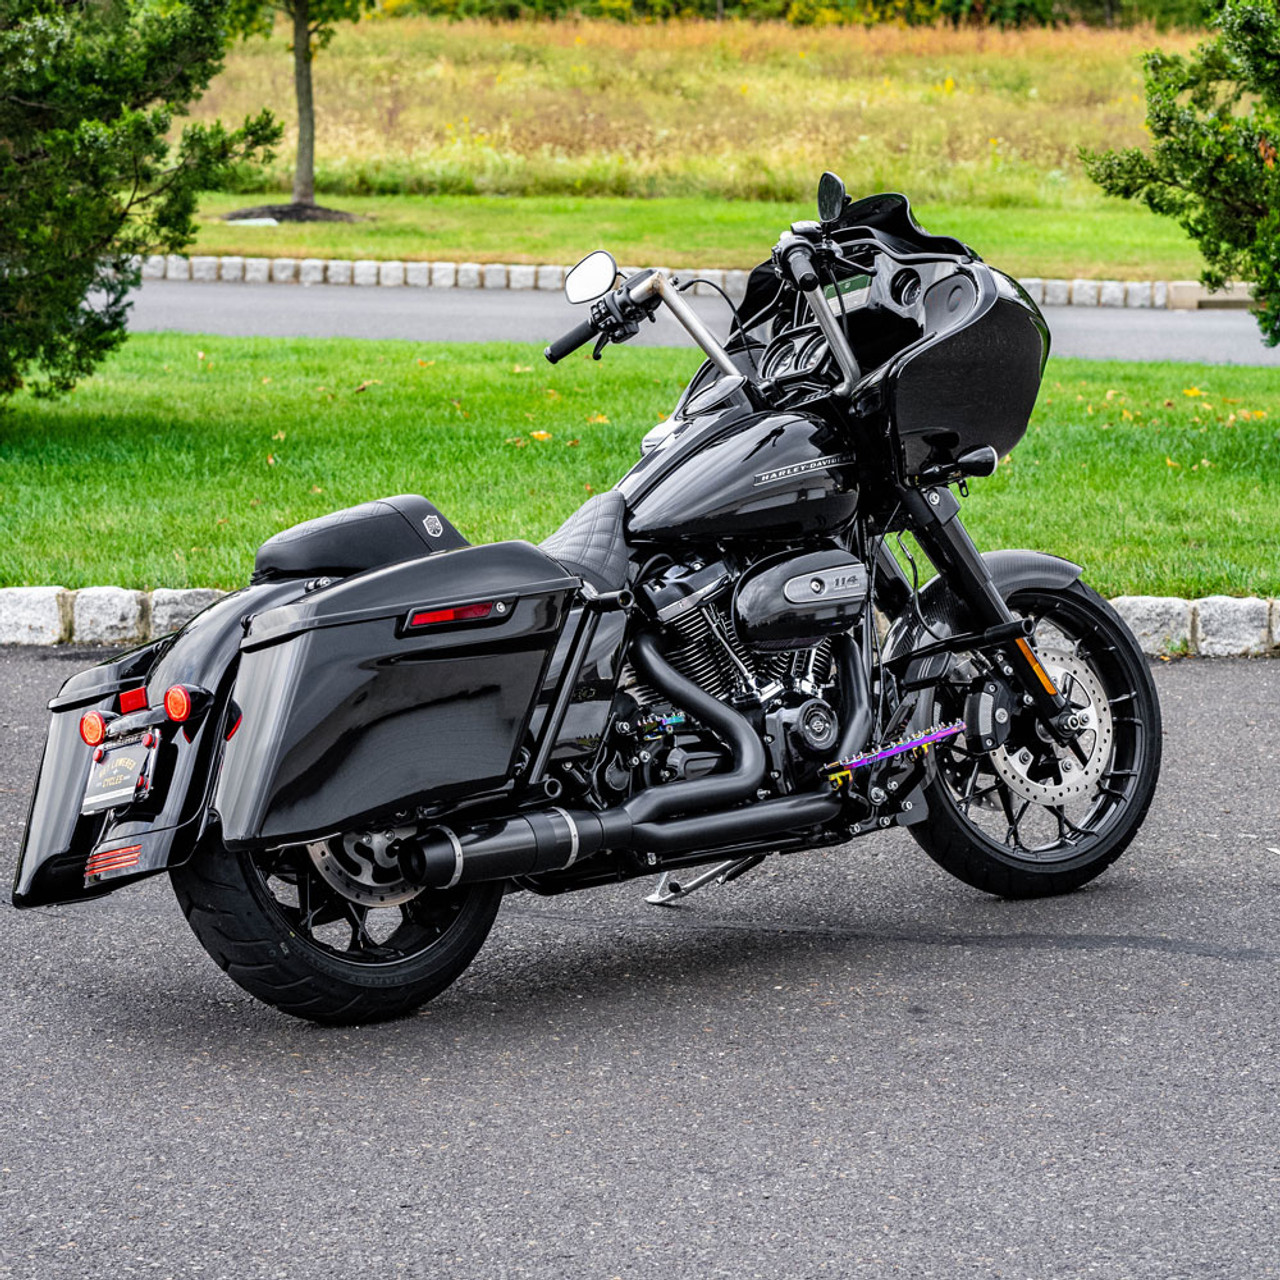 d d carbon fiber bob cat 2 into 1 exhaust for 2017 2020 harley touring black